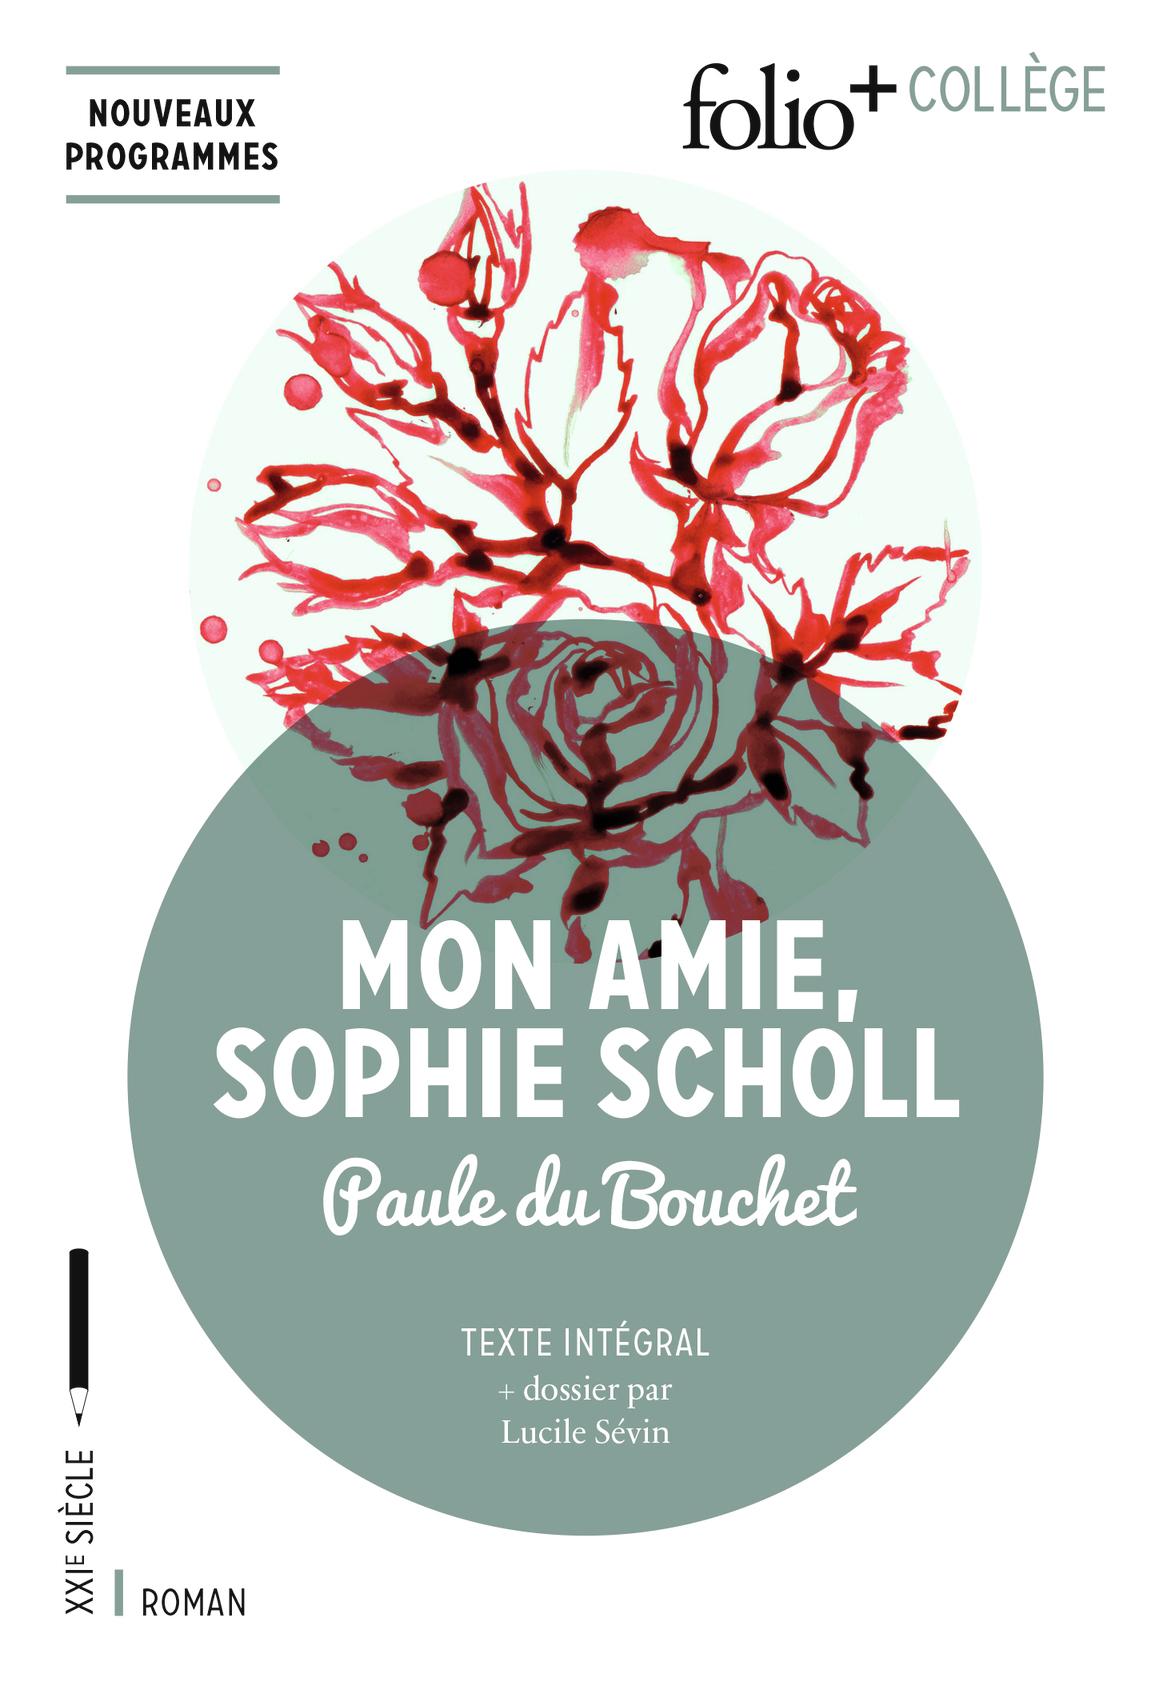 MON AMIE SOPHIE SCHOLL